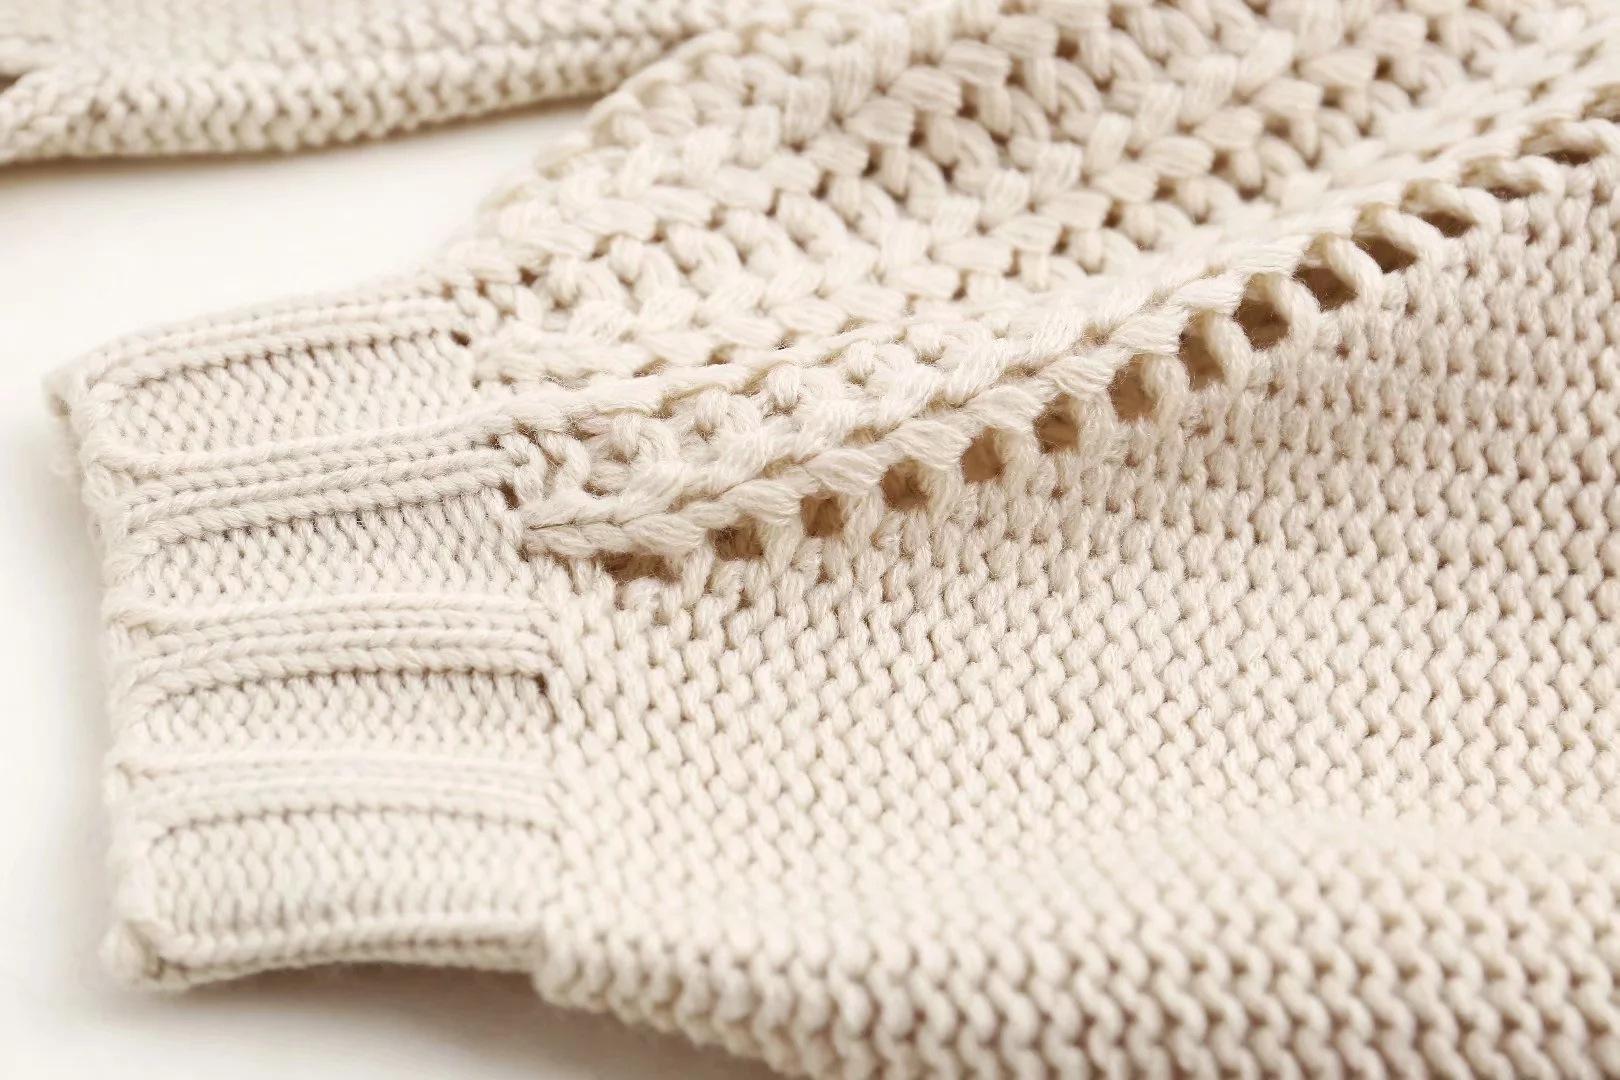 Autumn and Winter 19 Korean Women's Sweater Tassel Pullover Knit Sweater Women Sweaters and Pullovers Winter Clothes Women 9